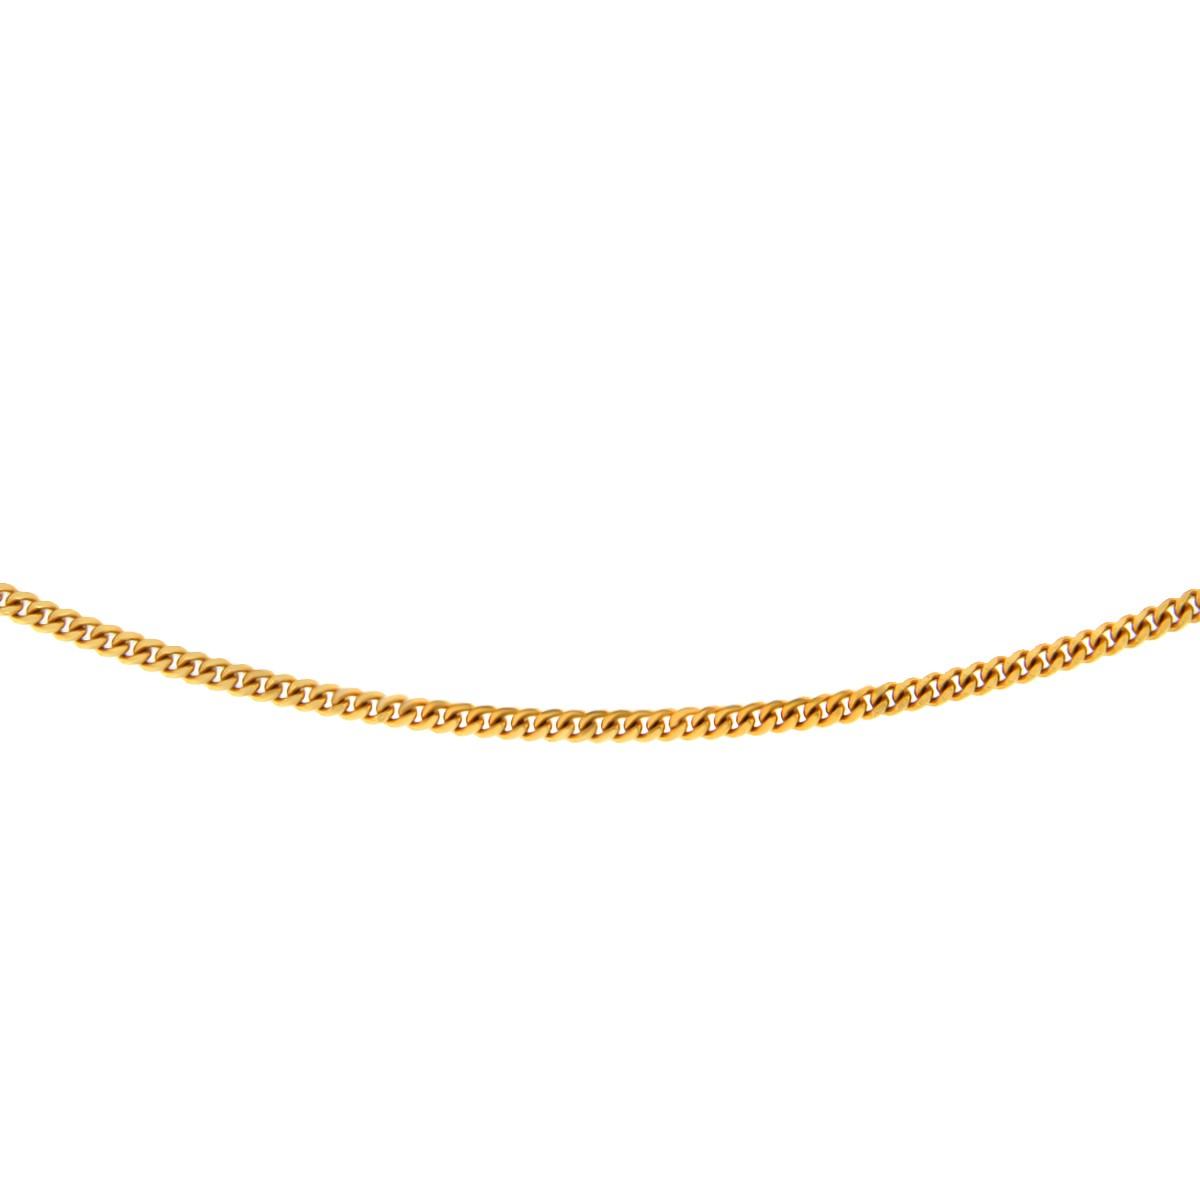 Kullast kaelakett Kood: 2lg